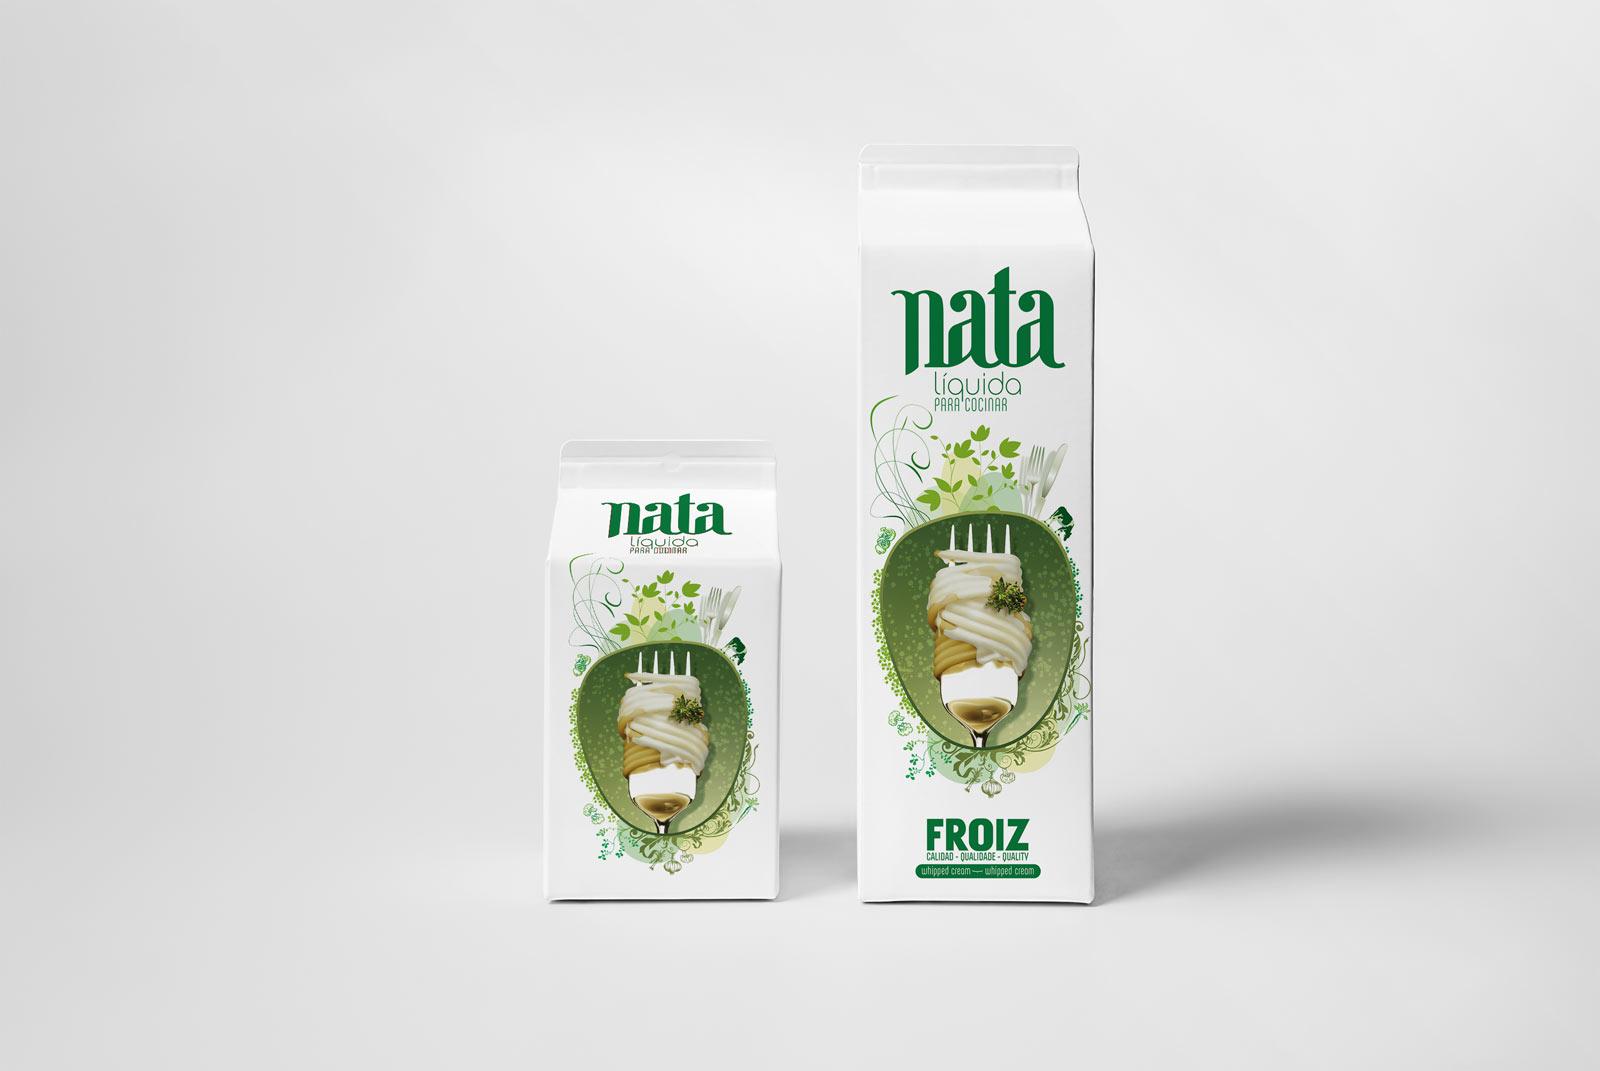 Froiz-nata-packaging-05